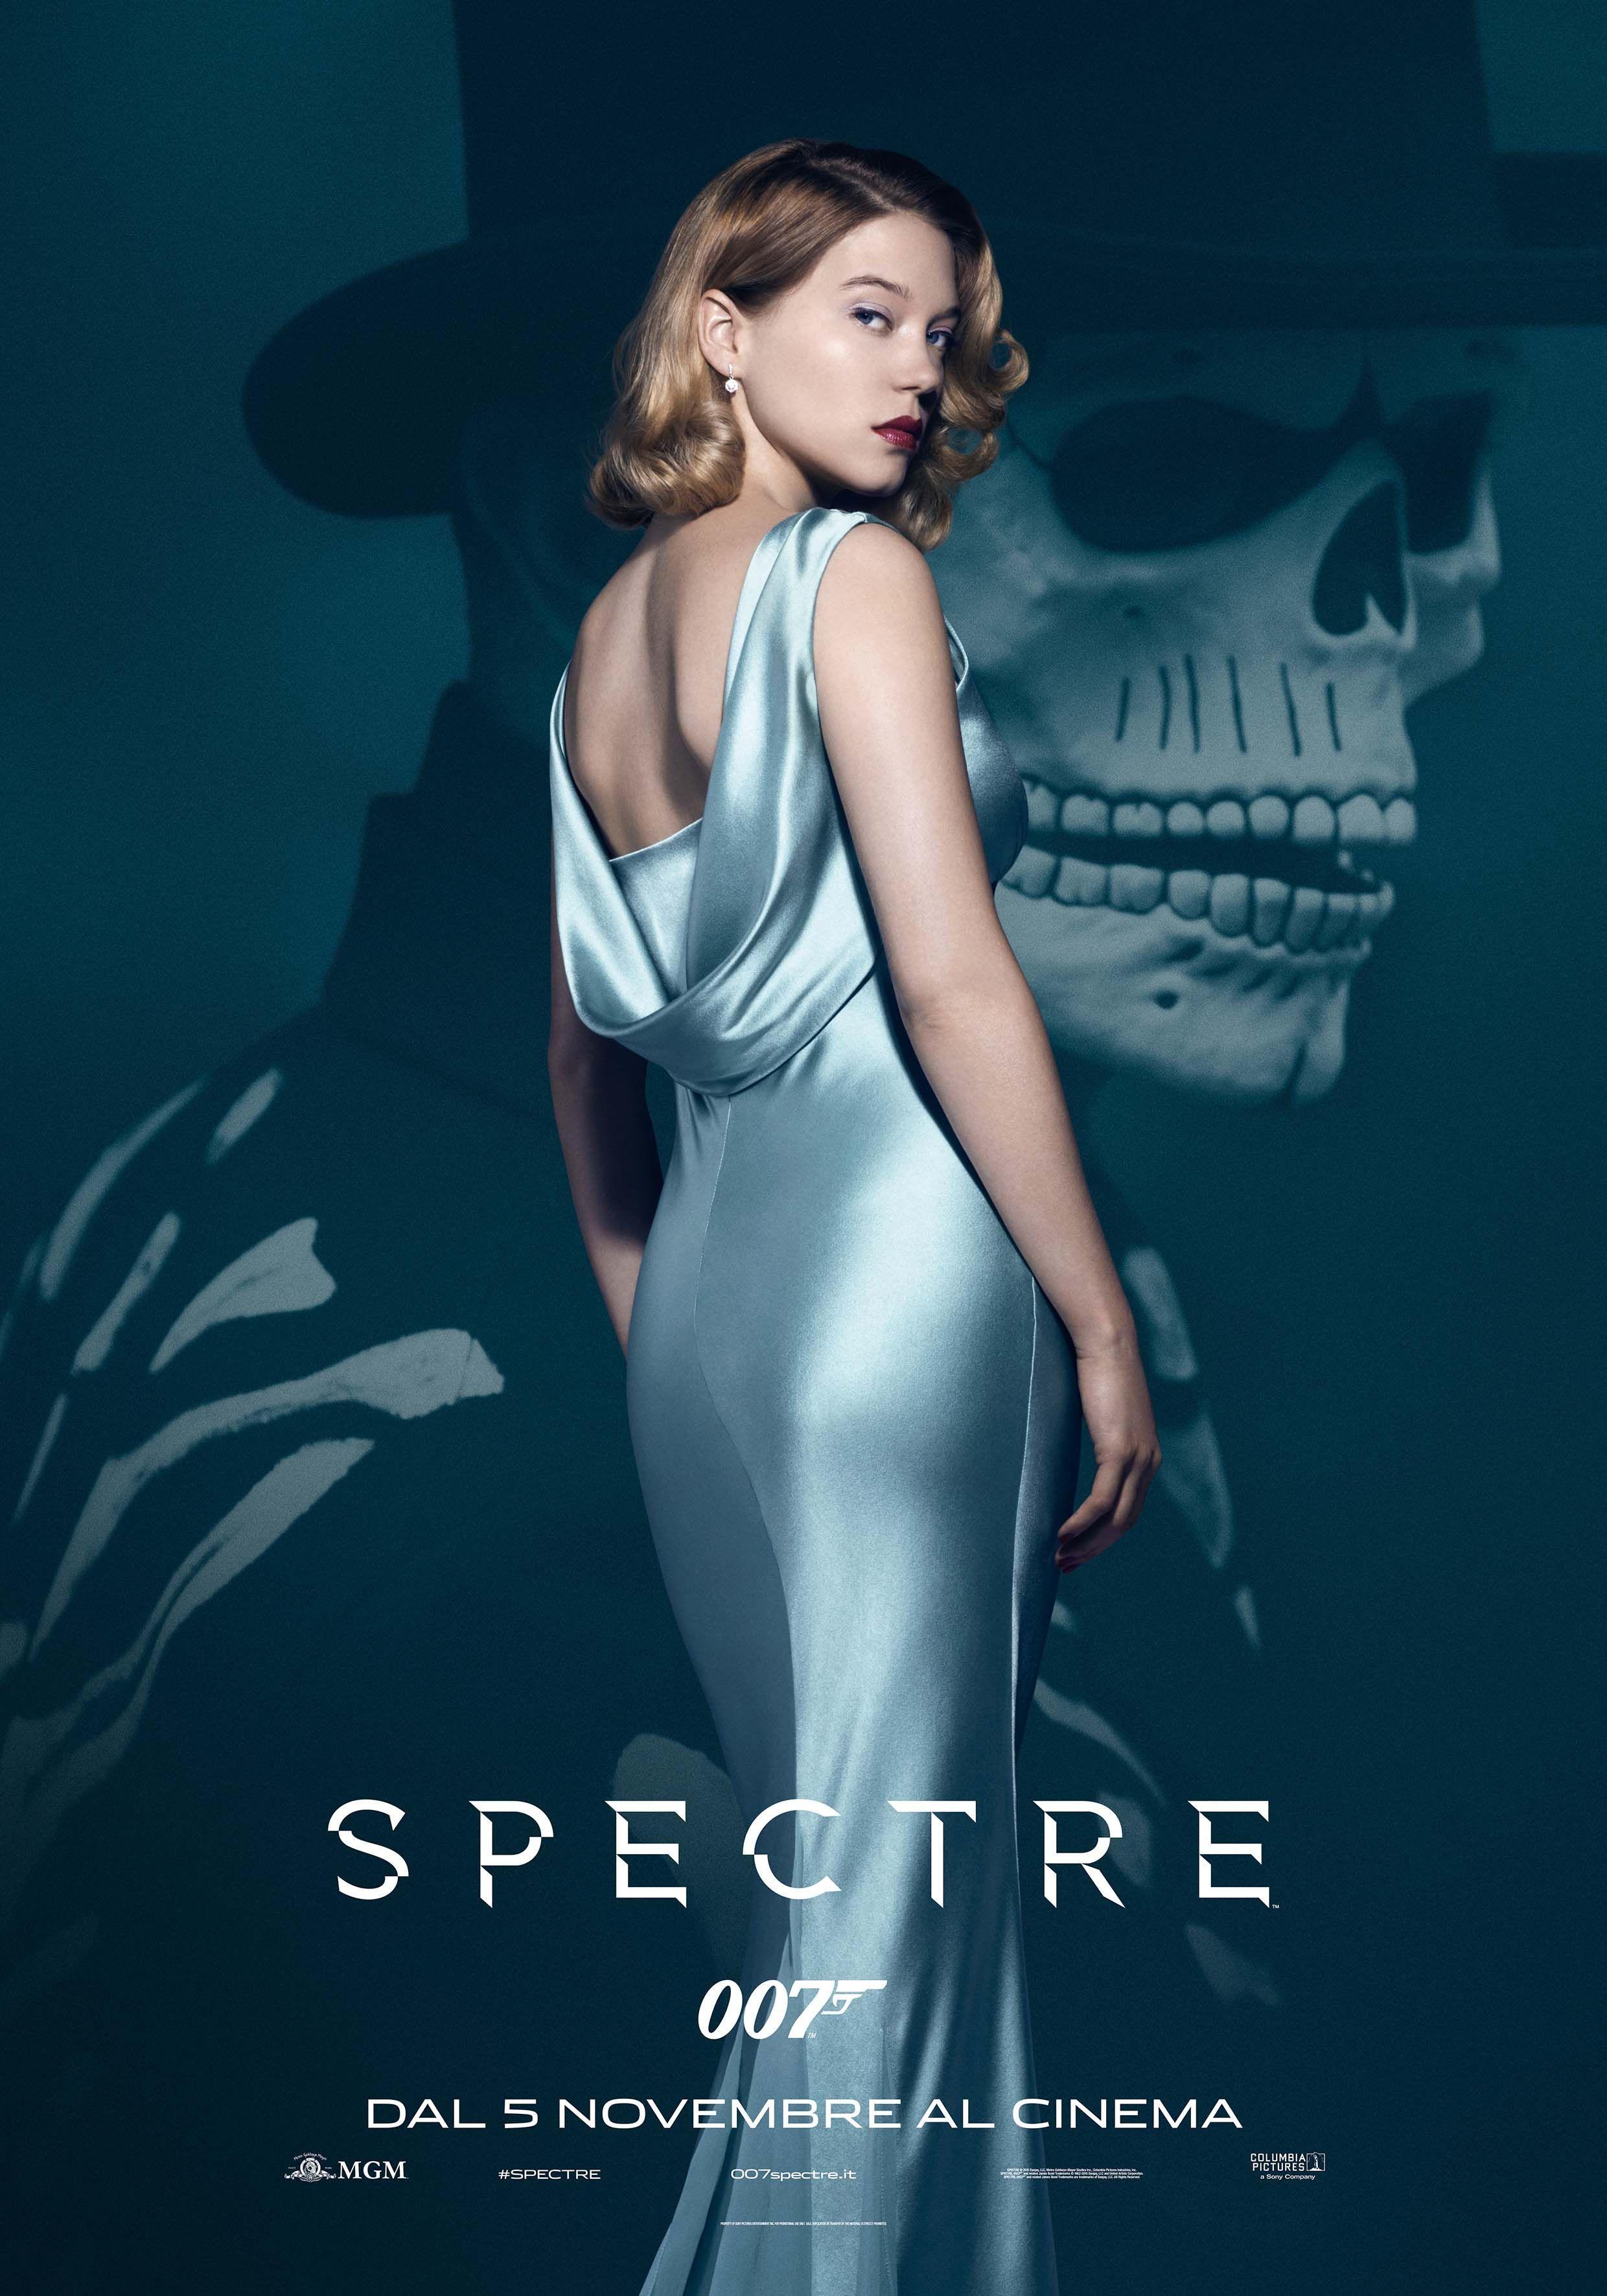 Lea Seydoux in  Spectre: character poster esclusivo